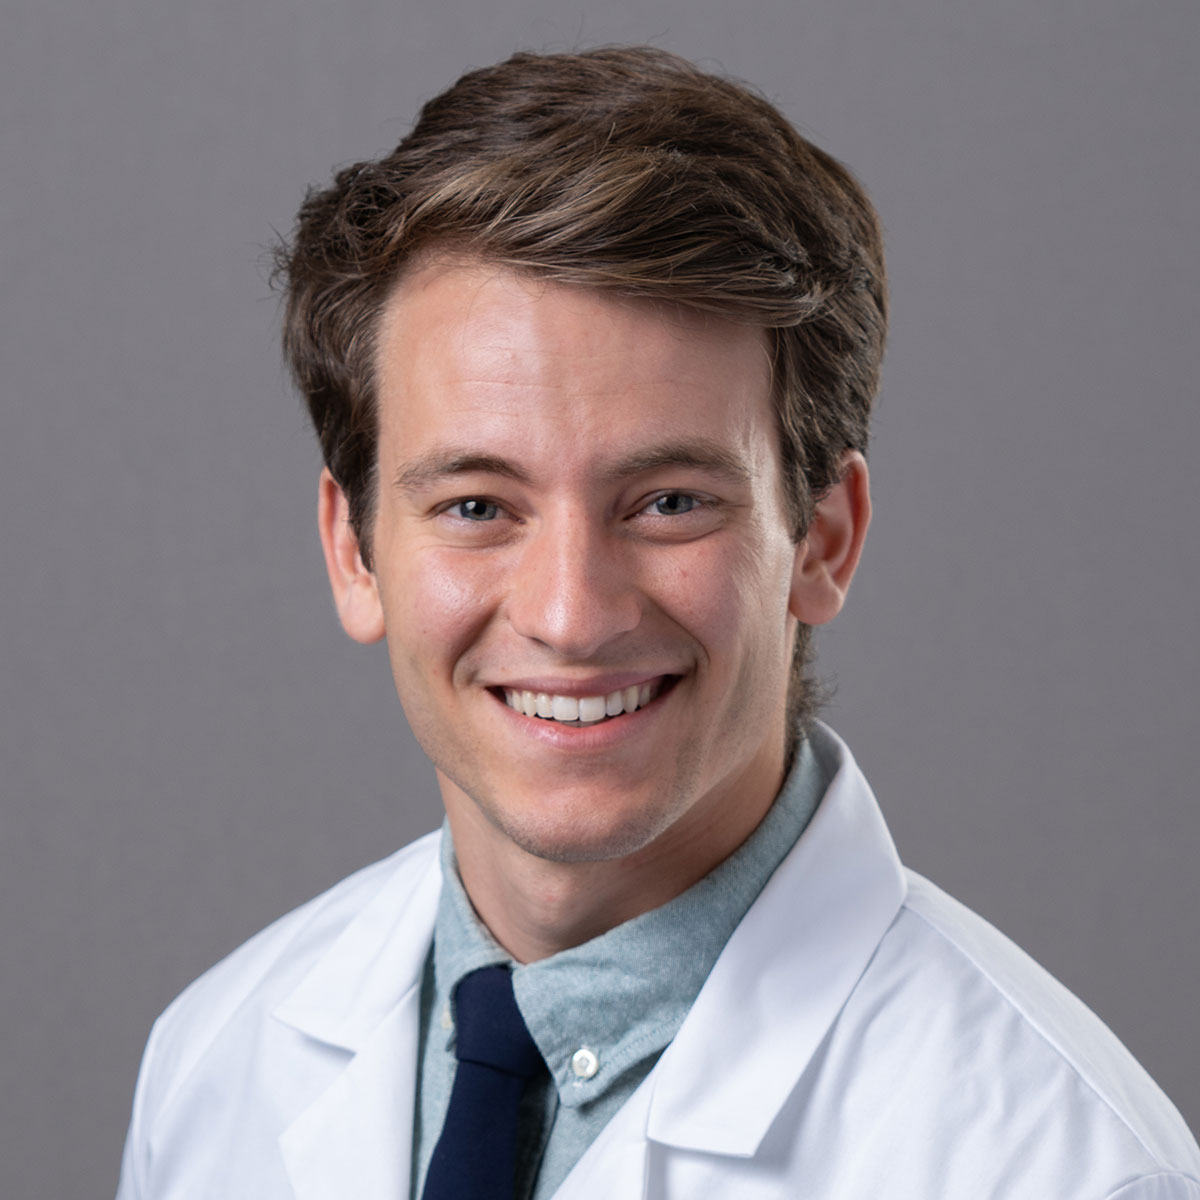 A friendly headshot of Dr. Karson Mostert